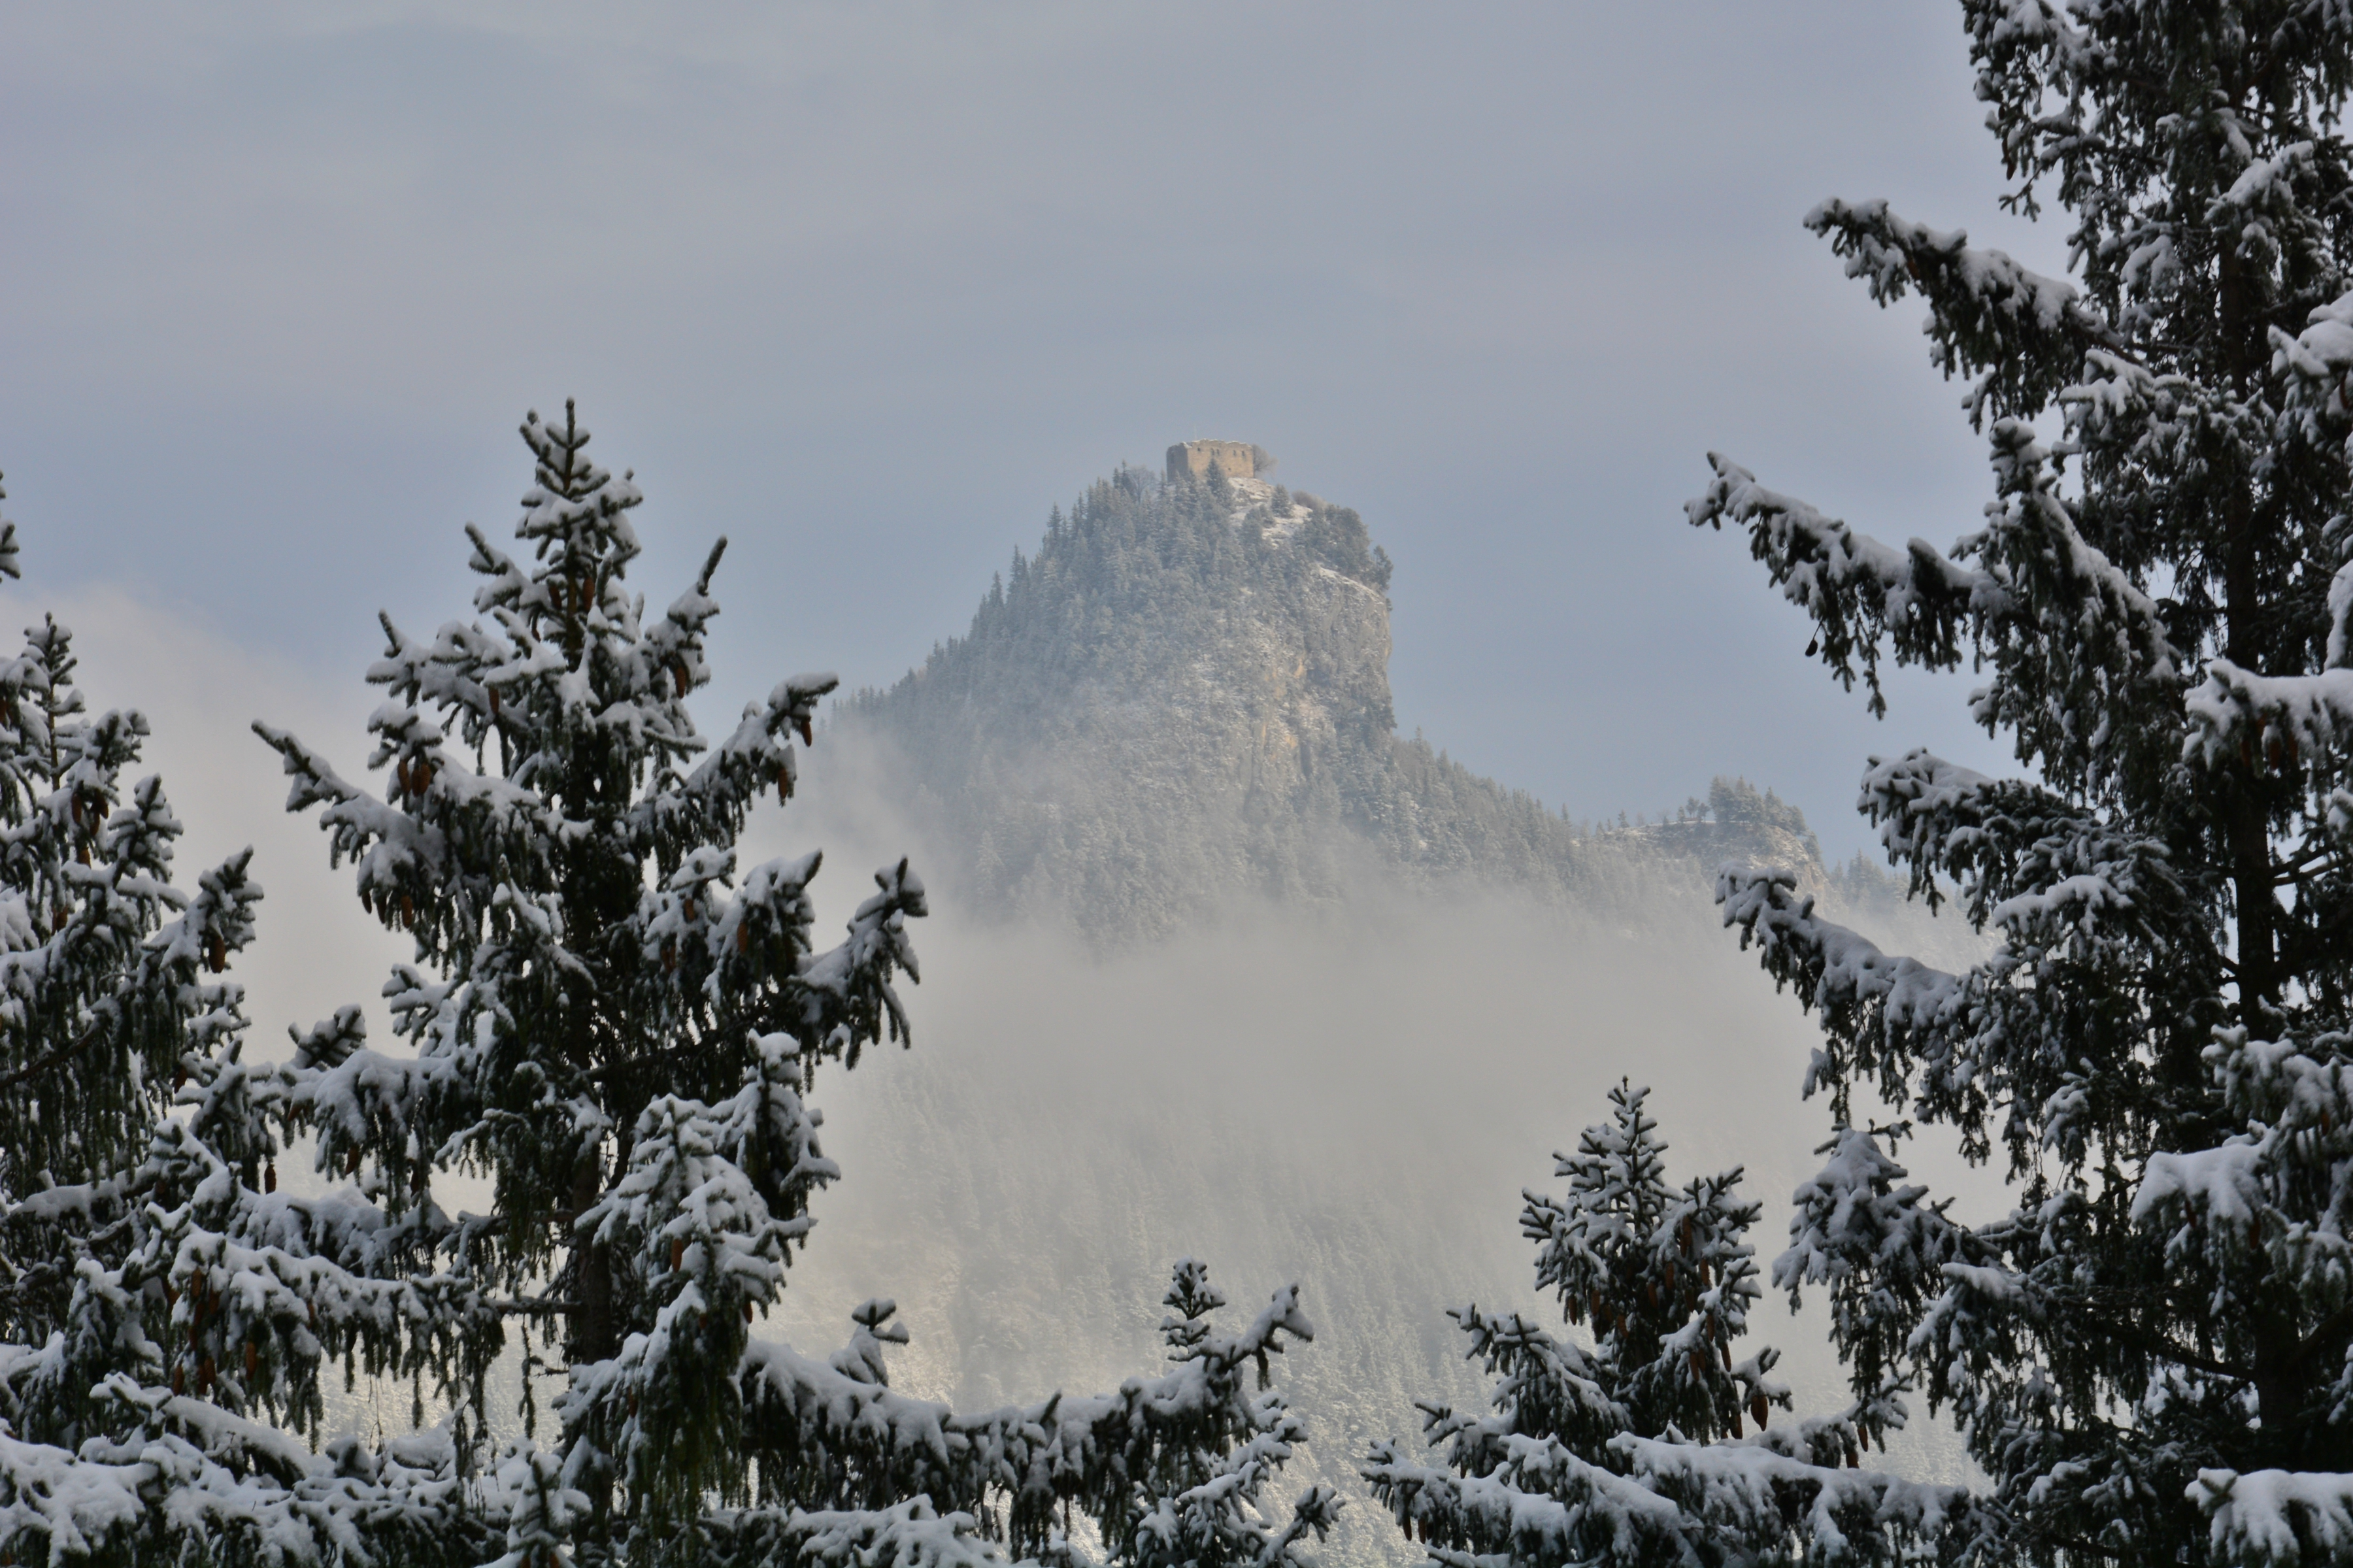 W0258 Ruine Falkenstein Winterwald.jpg